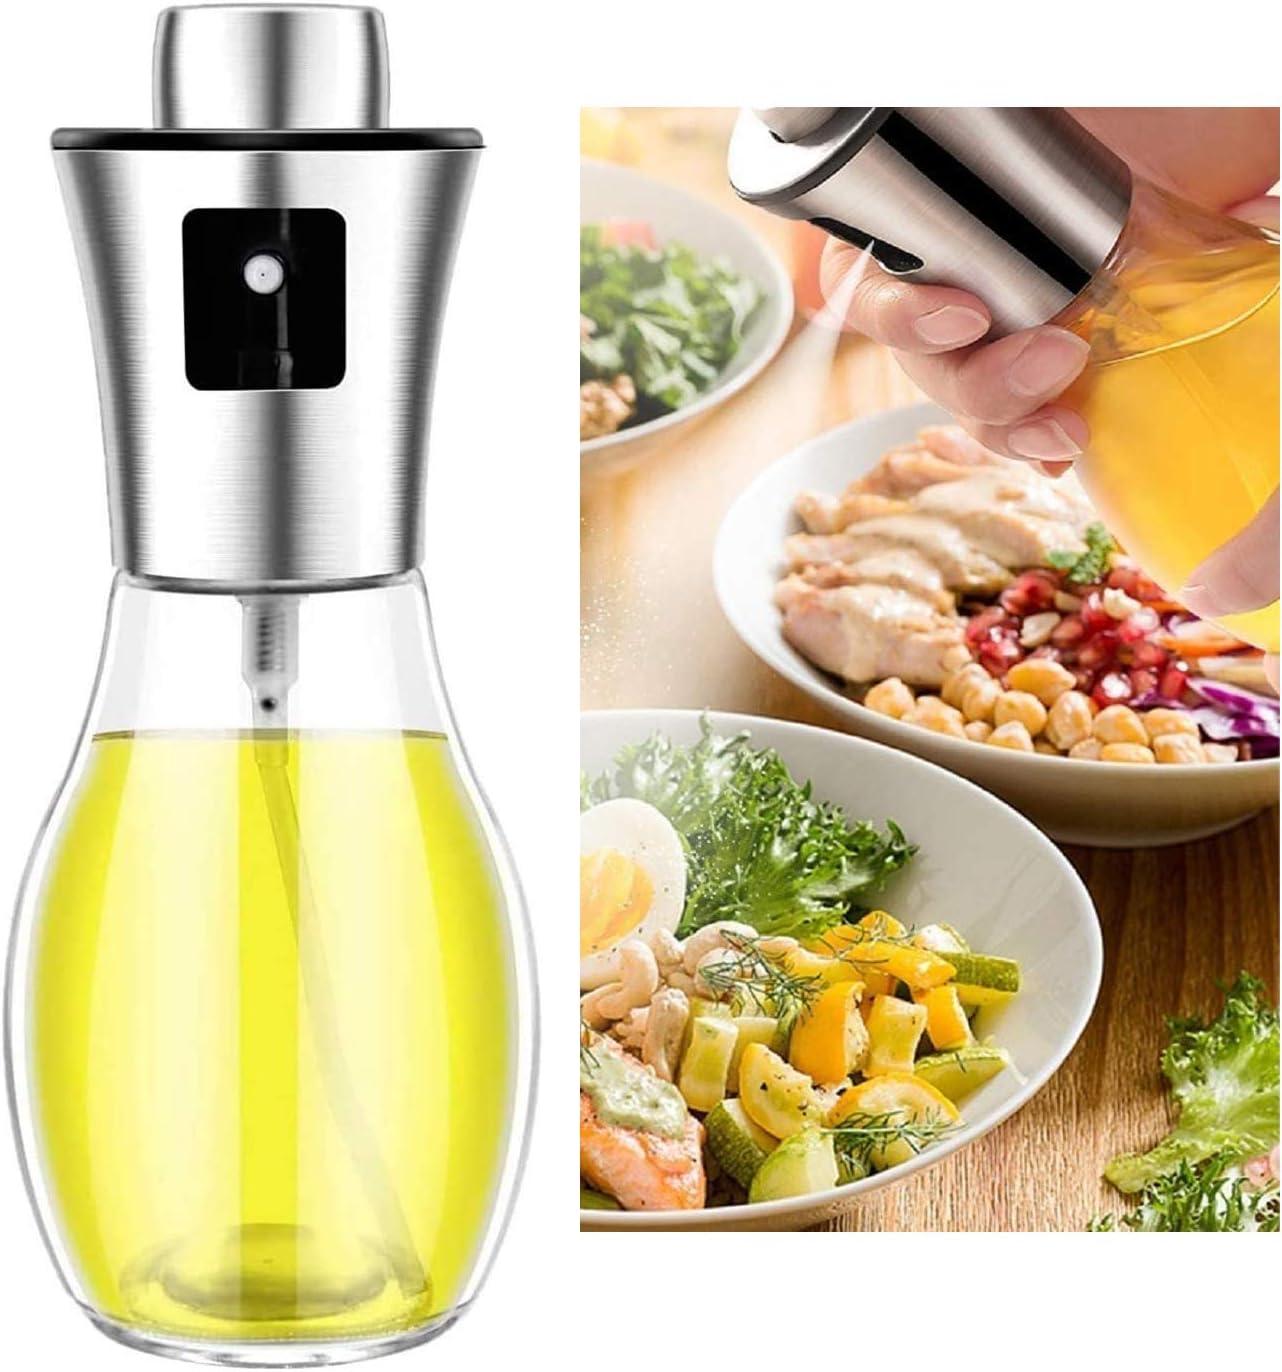 Olive Oil Sprayer Dispenser for cooking, Food-grade Glass Oil Spray Transparent Vinegar Bottle Oil Dispenser 200ml for BBQ/Making Salad/Baking/Roasting/Grilling/Frying Kitchen.